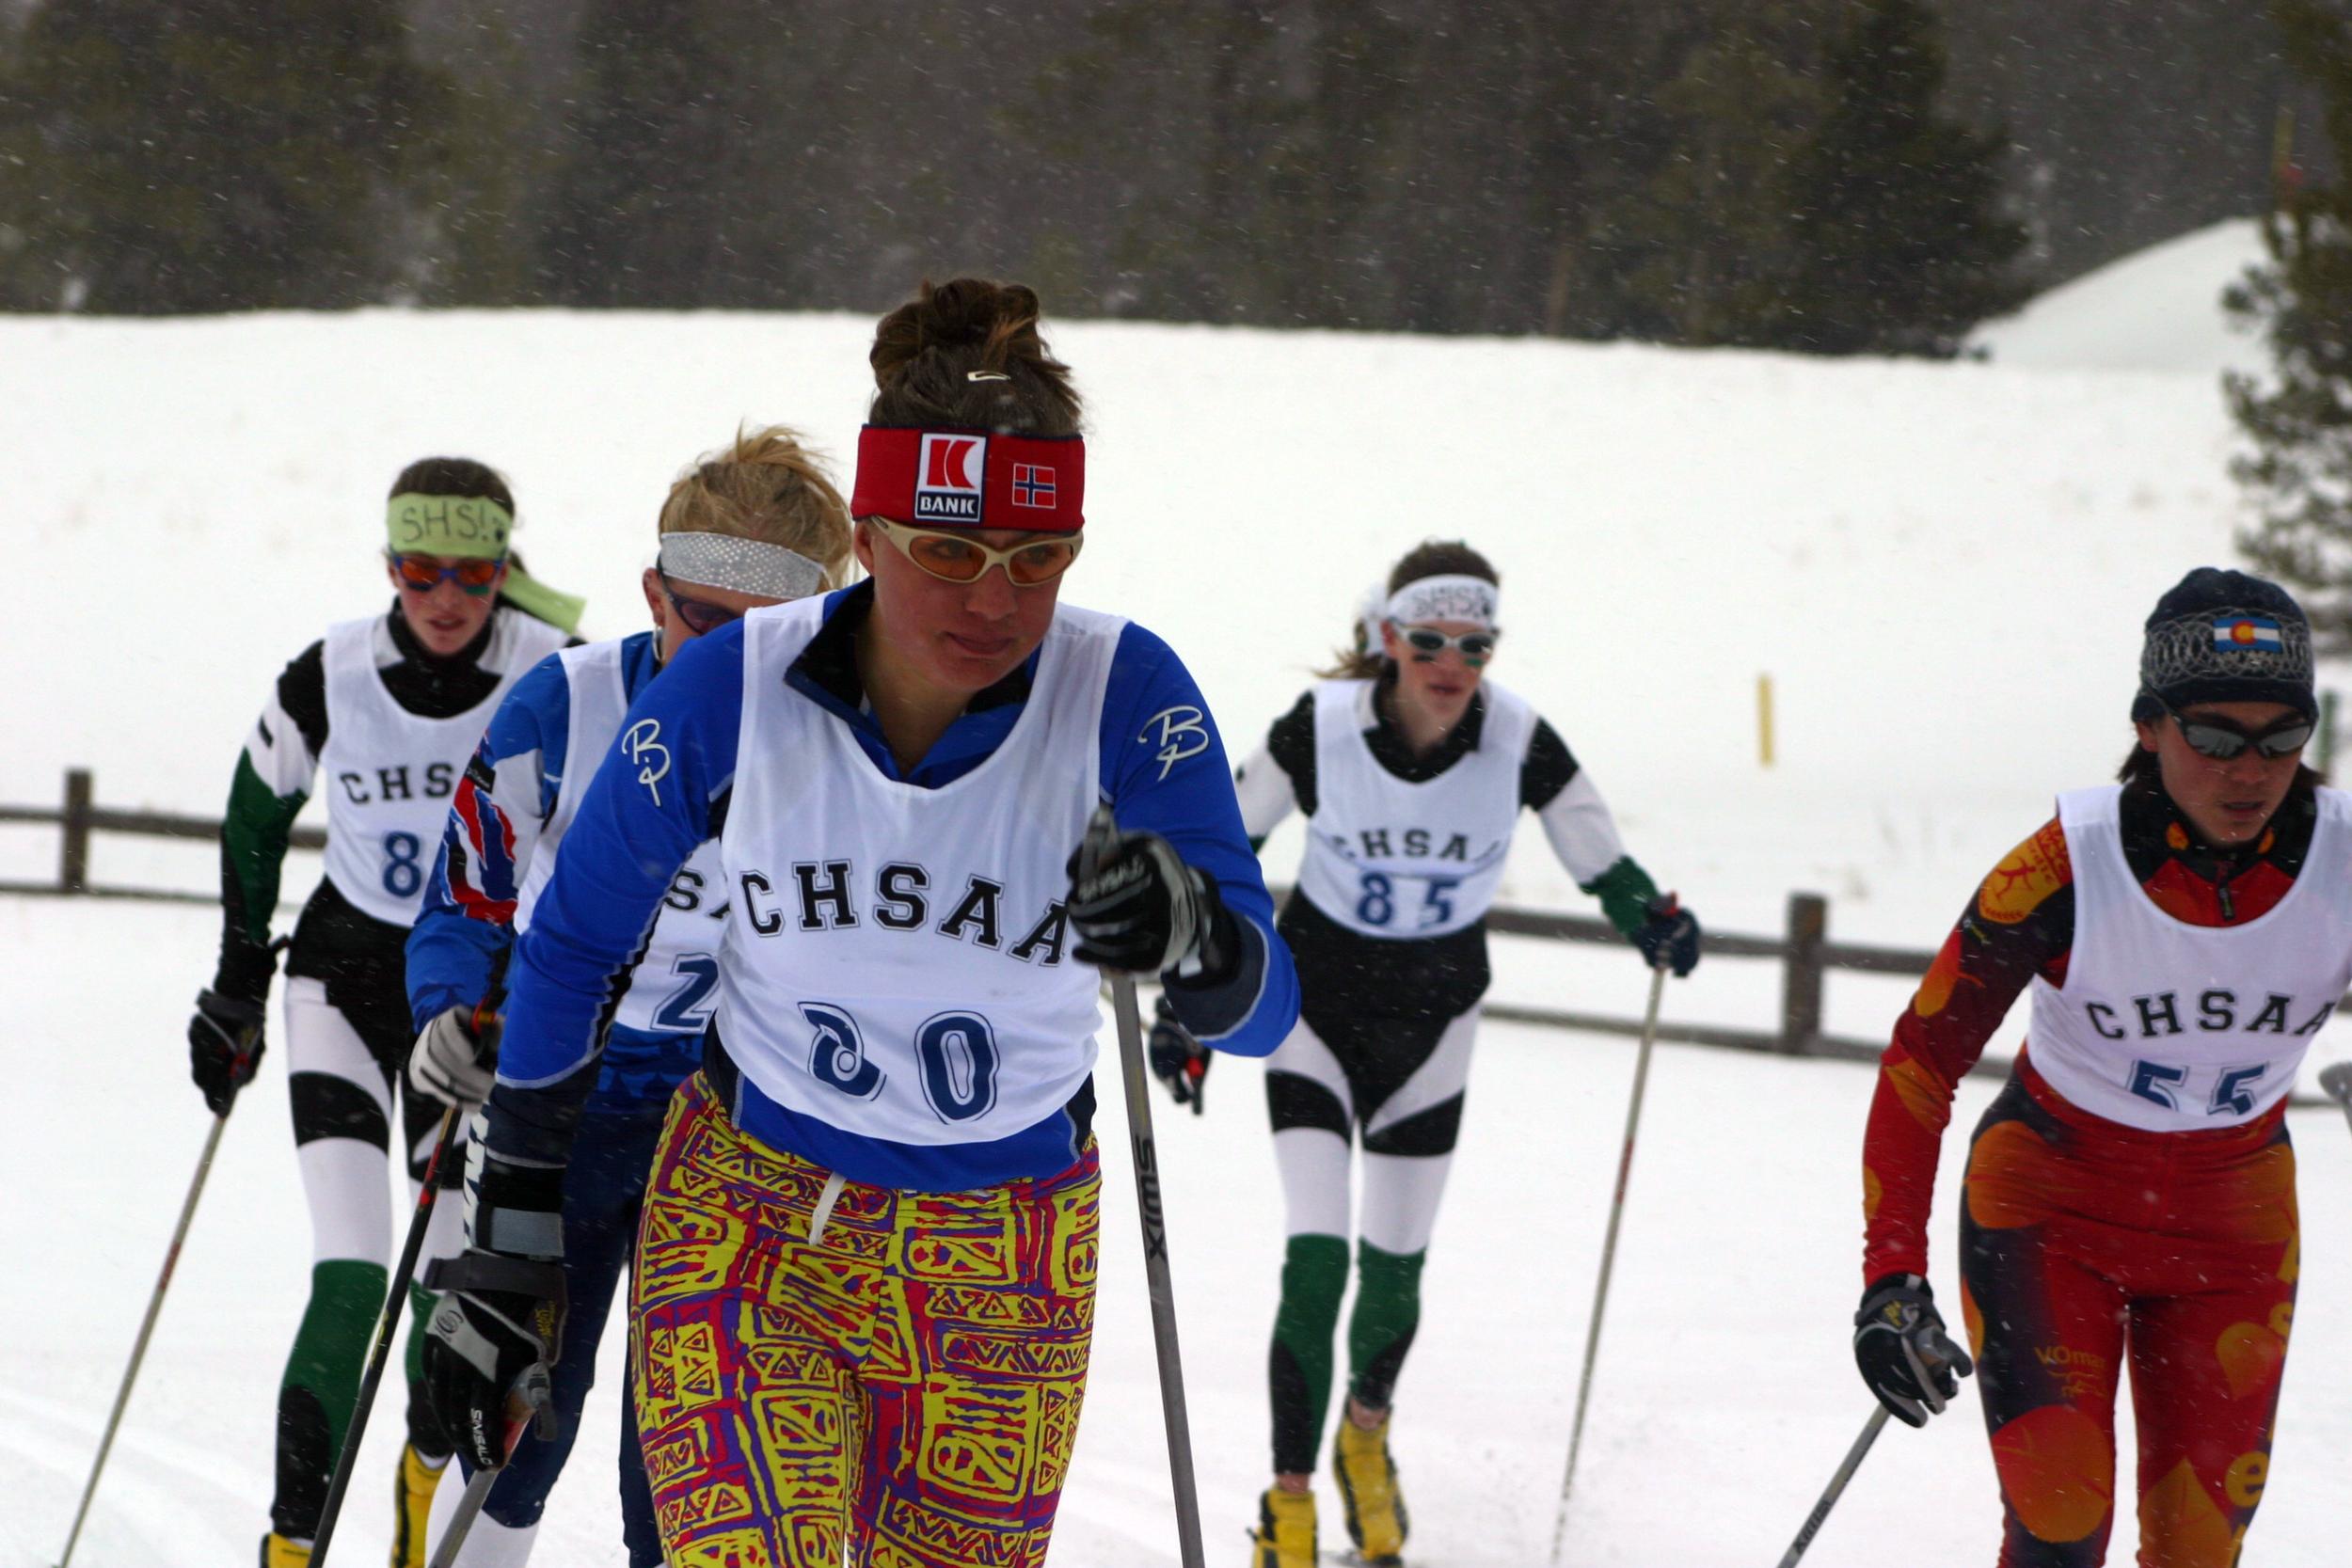 B Nordic Ski Pm 21905 002.jpg